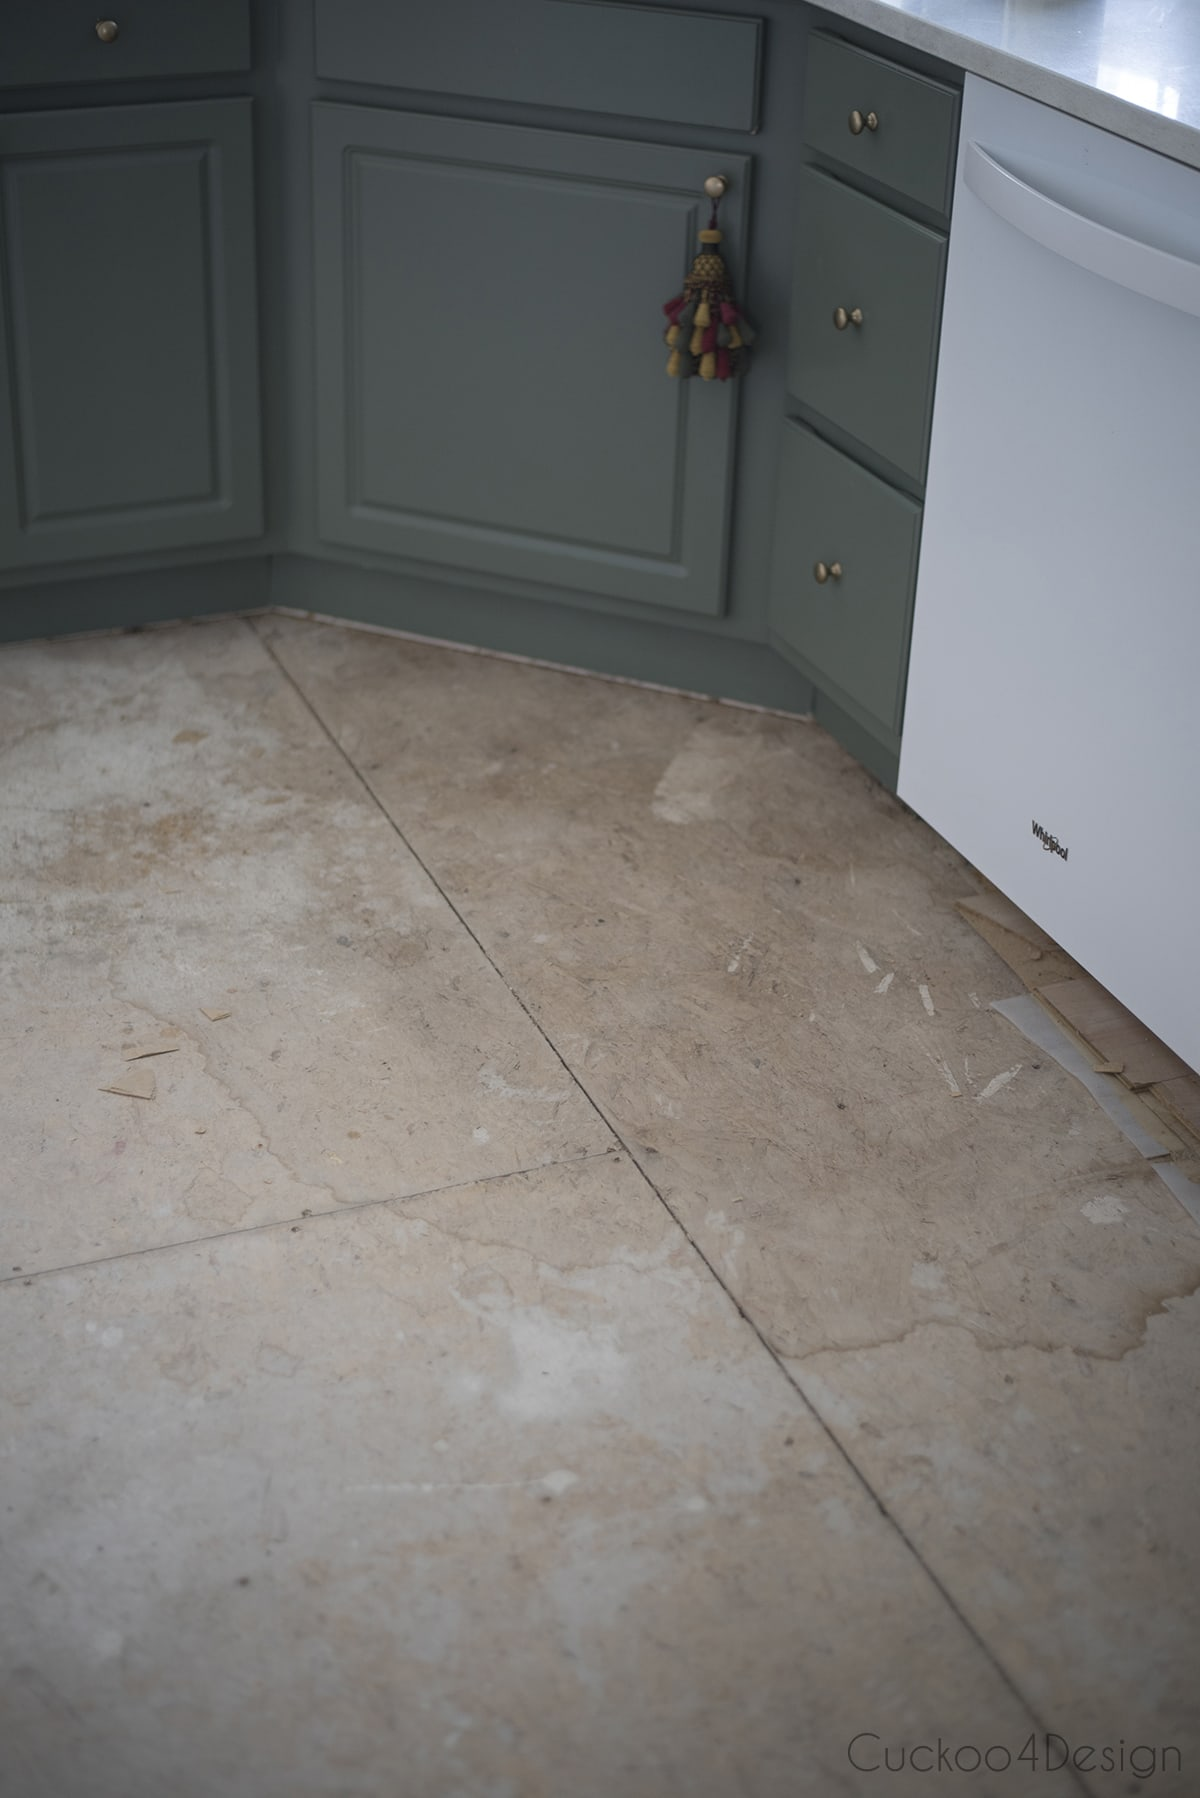 water stain on subfloor in kitchen